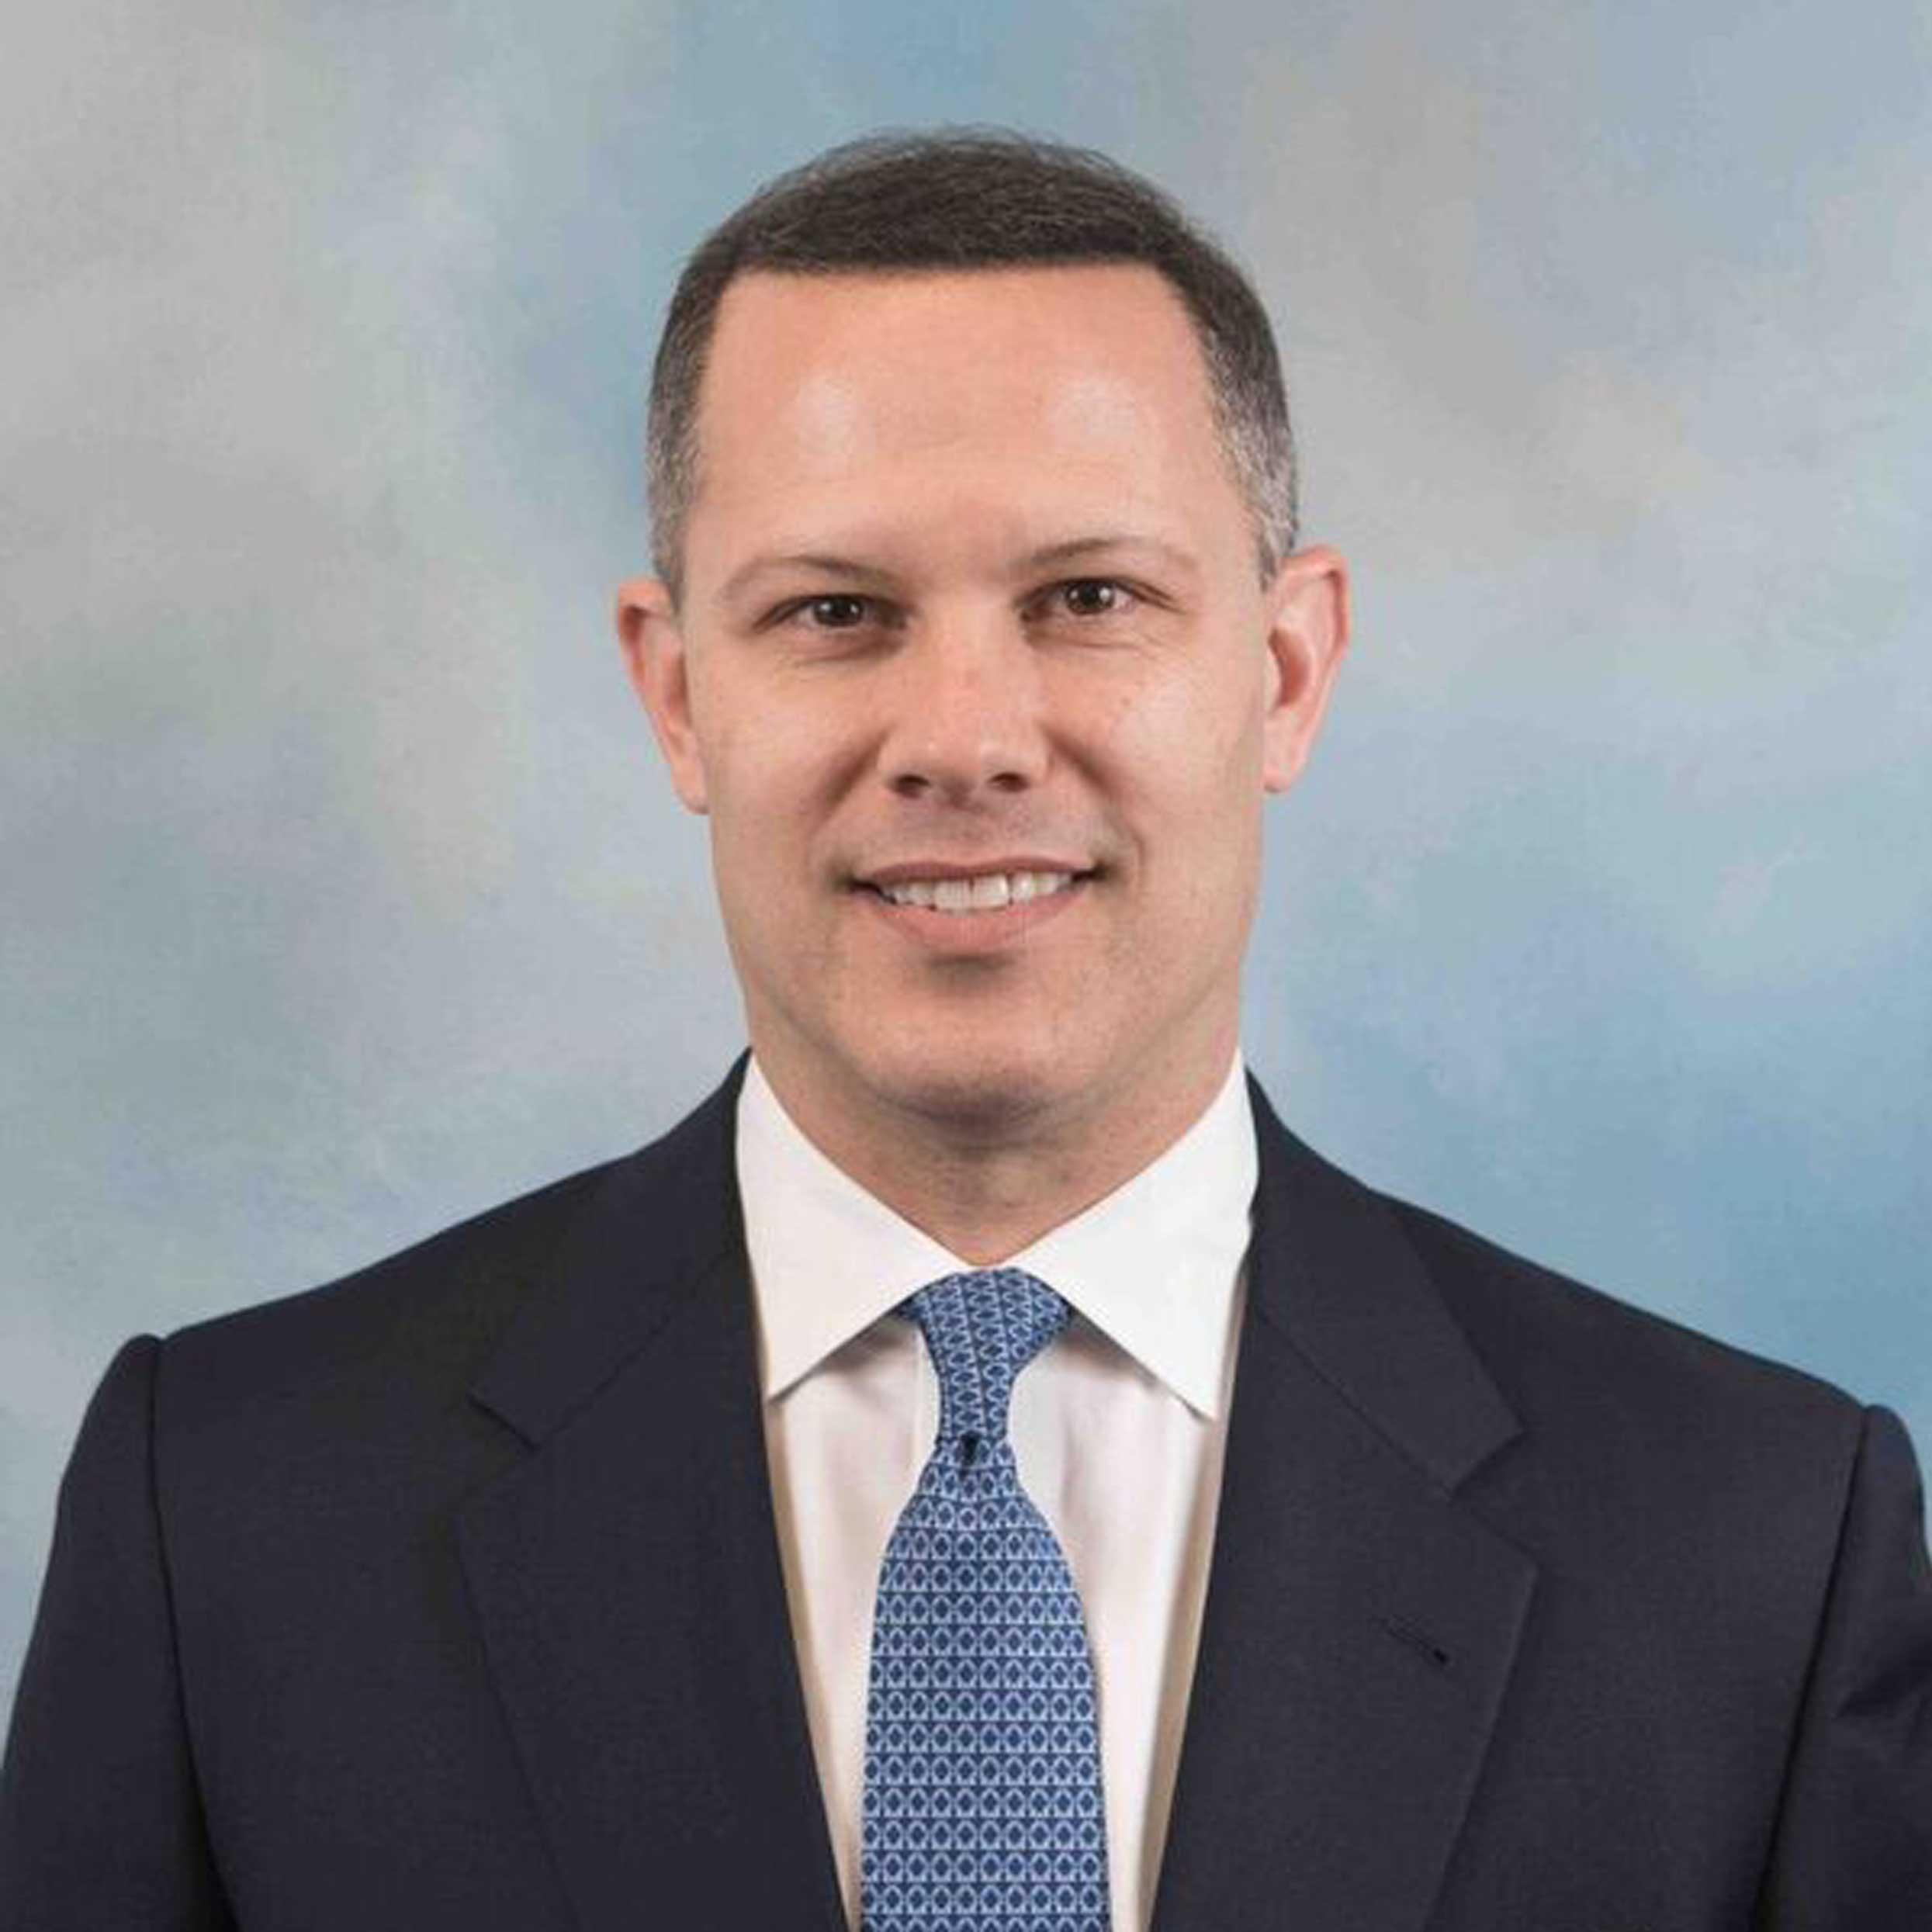 Brian J. Wasilewski